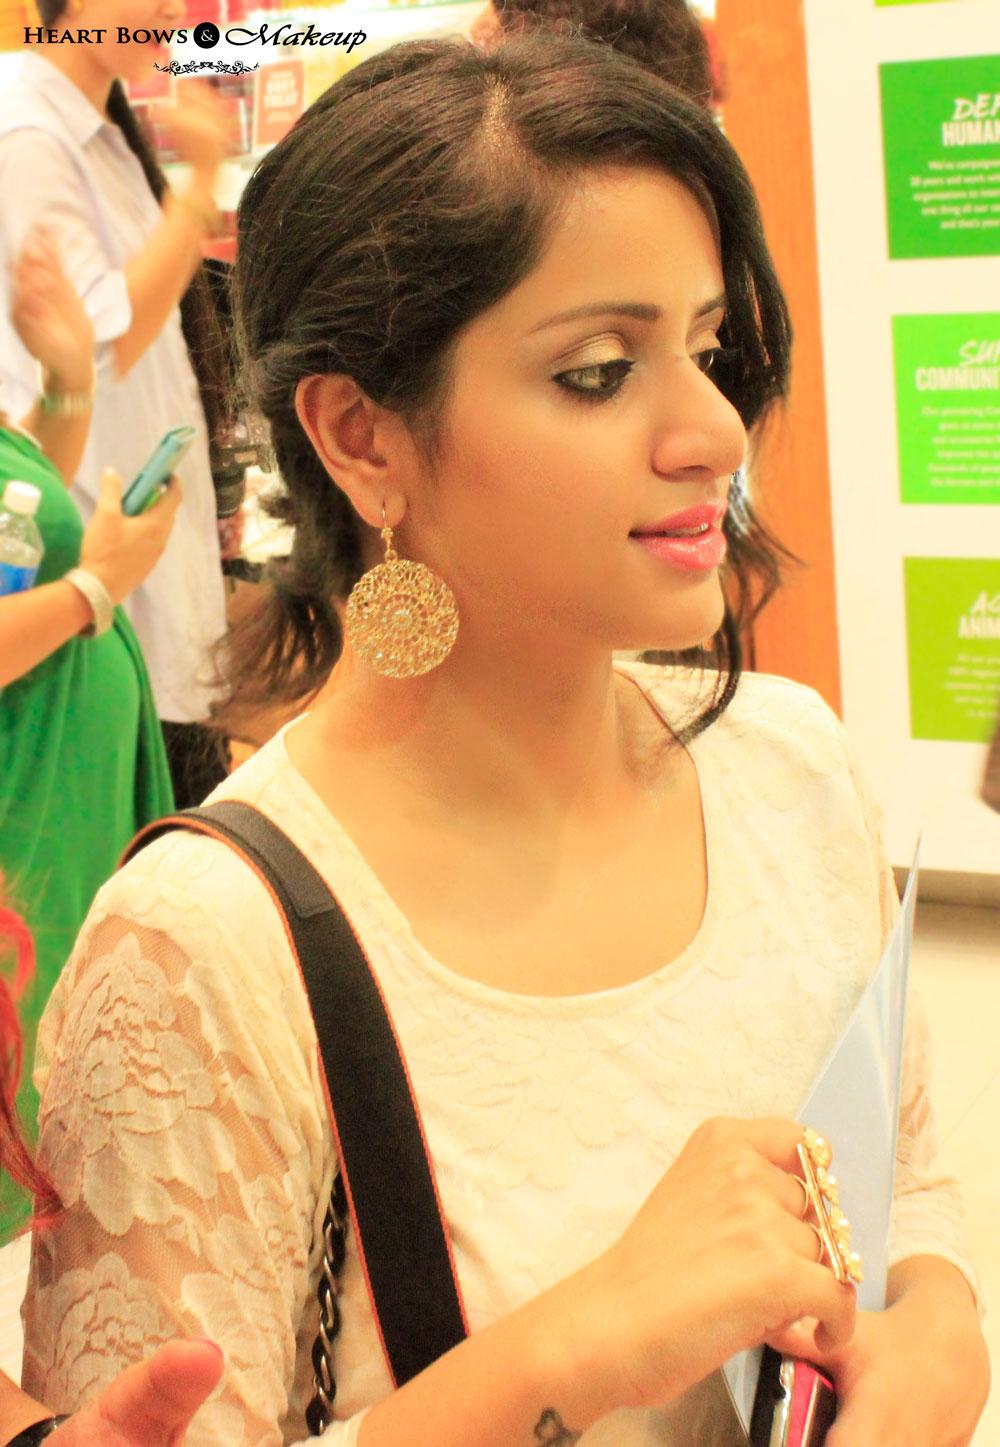 Indian Beauty Blog: My Khoobsurat Moment!